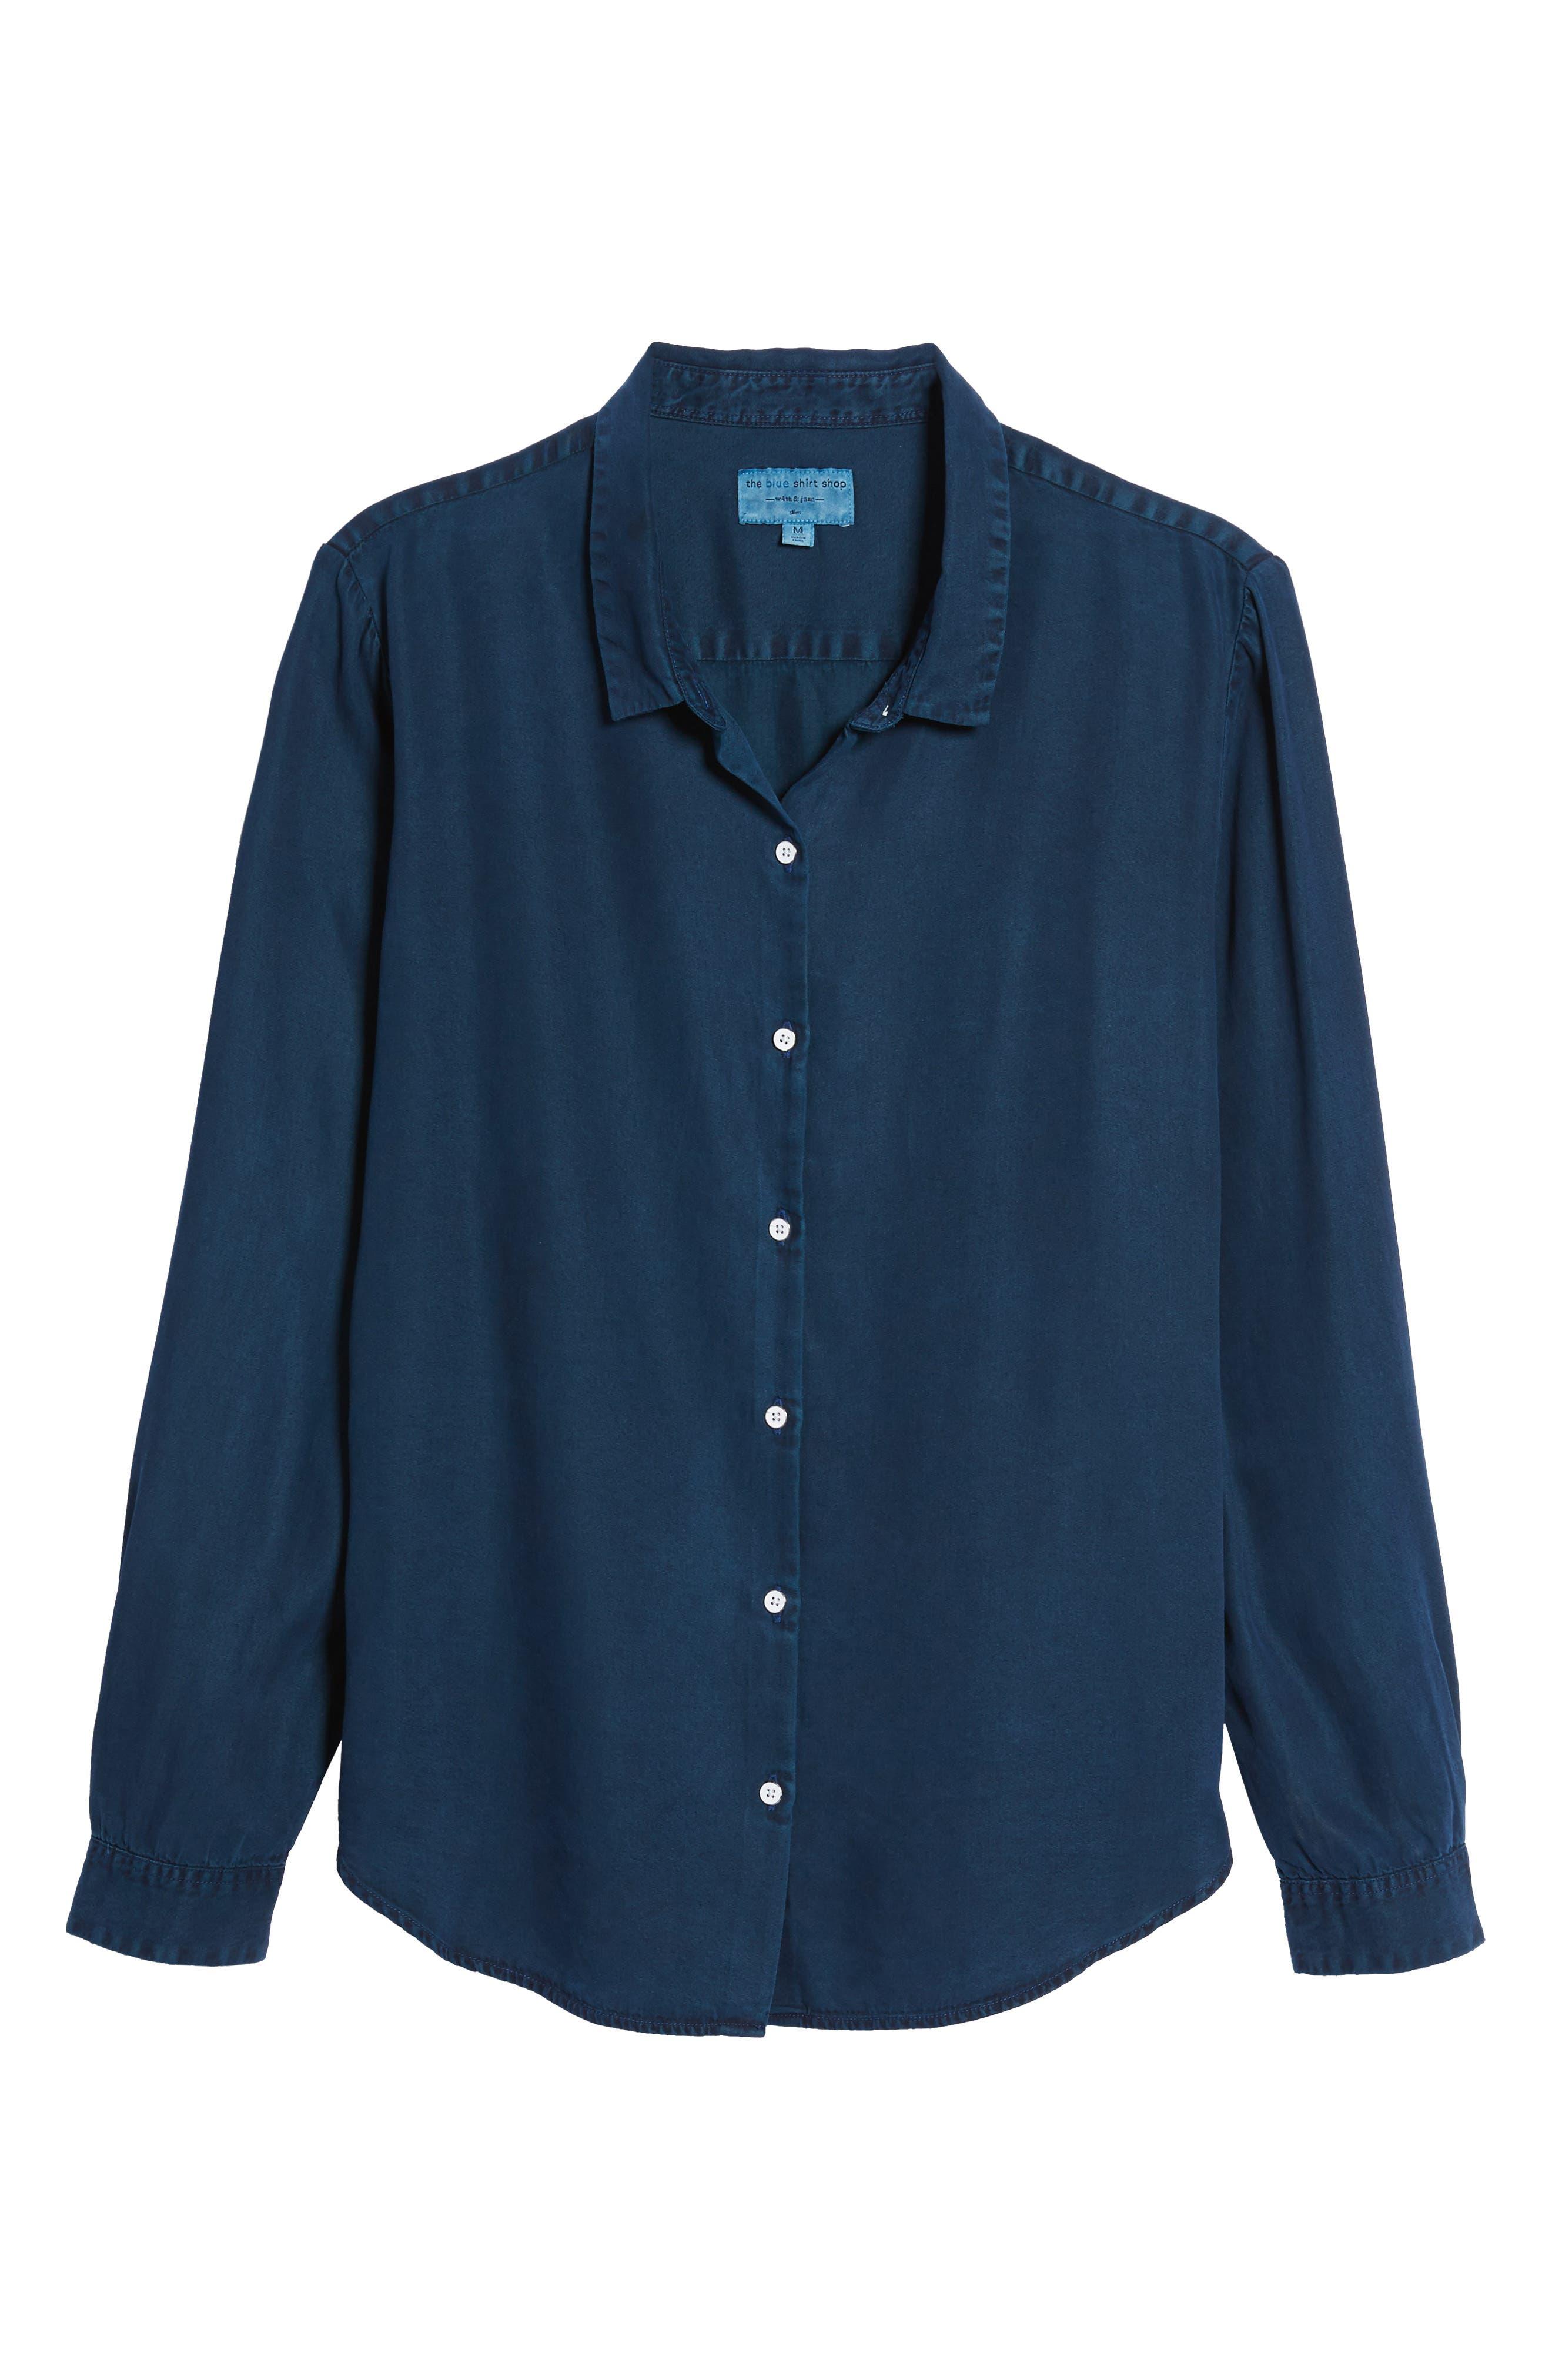 x The Blue Shirt Shop W 4th & Jane Slim Fit Shirt,                             Alternate thumbnail 6, color,                             405